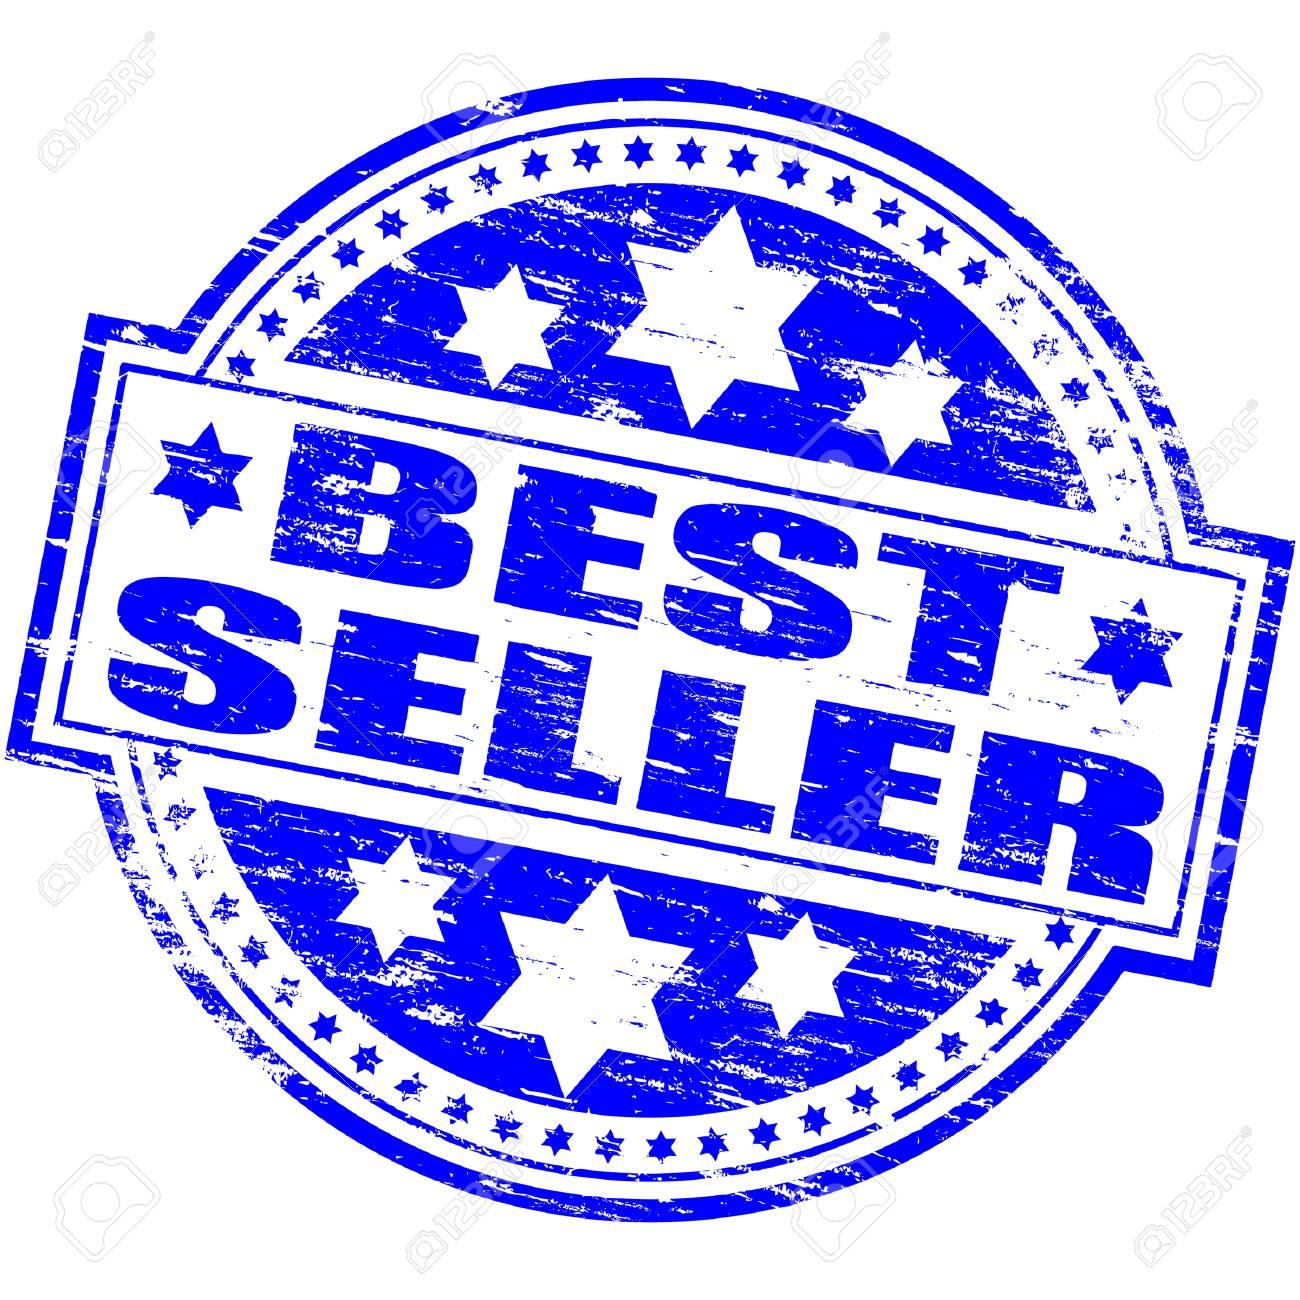 BEST SELLER Rubber Stamp Stock Vector - 8774131